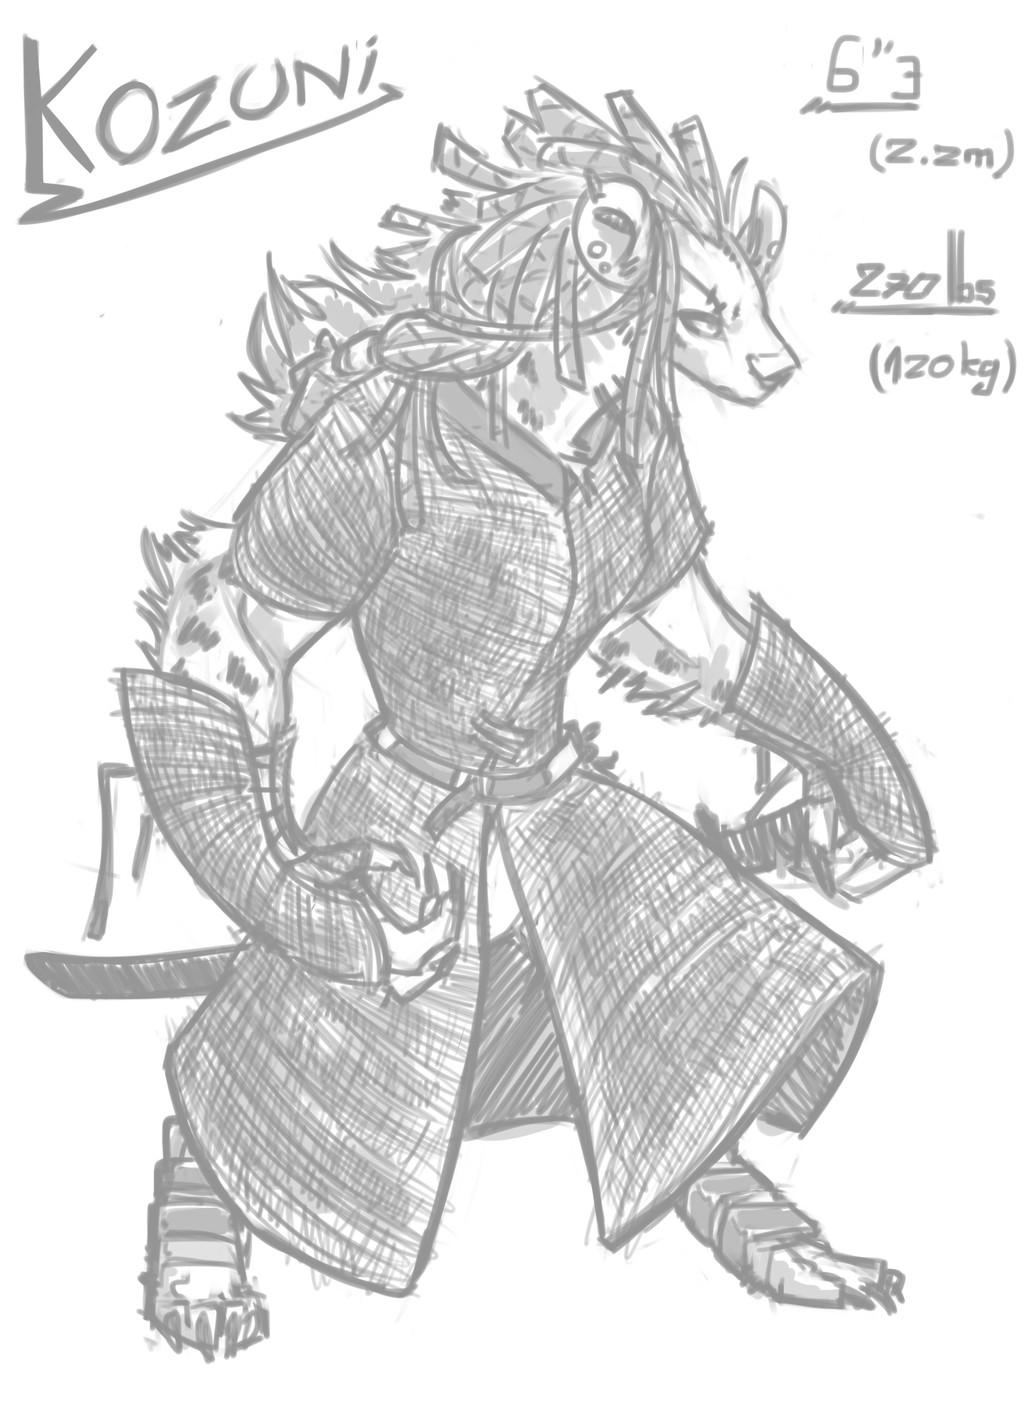 Most recent image: KOZU - 2